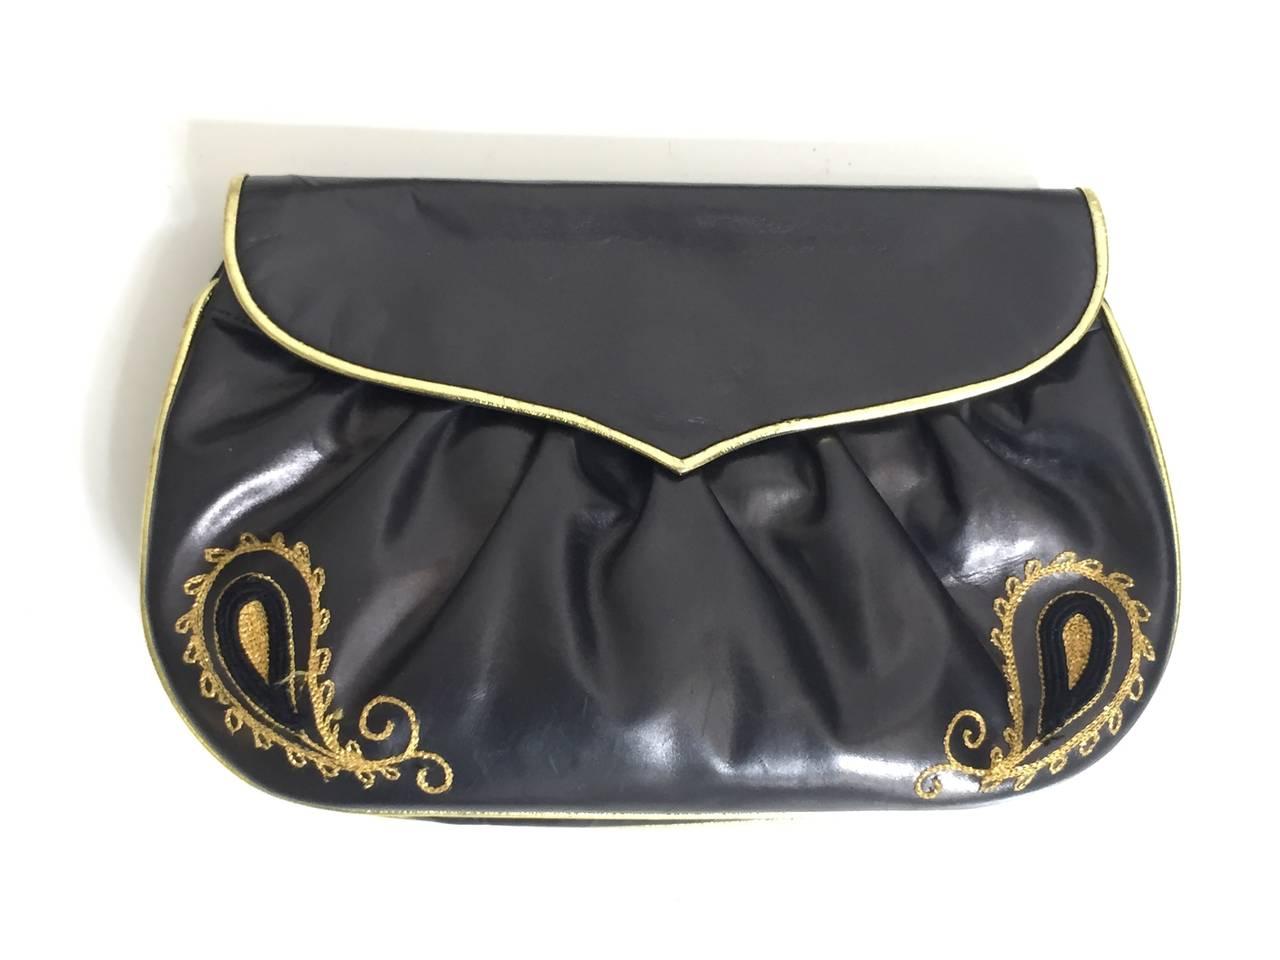 Barbara Bolan Black Leather Paisley Shoulder and/or Clutch Handbag, 1980s  For Sale 3